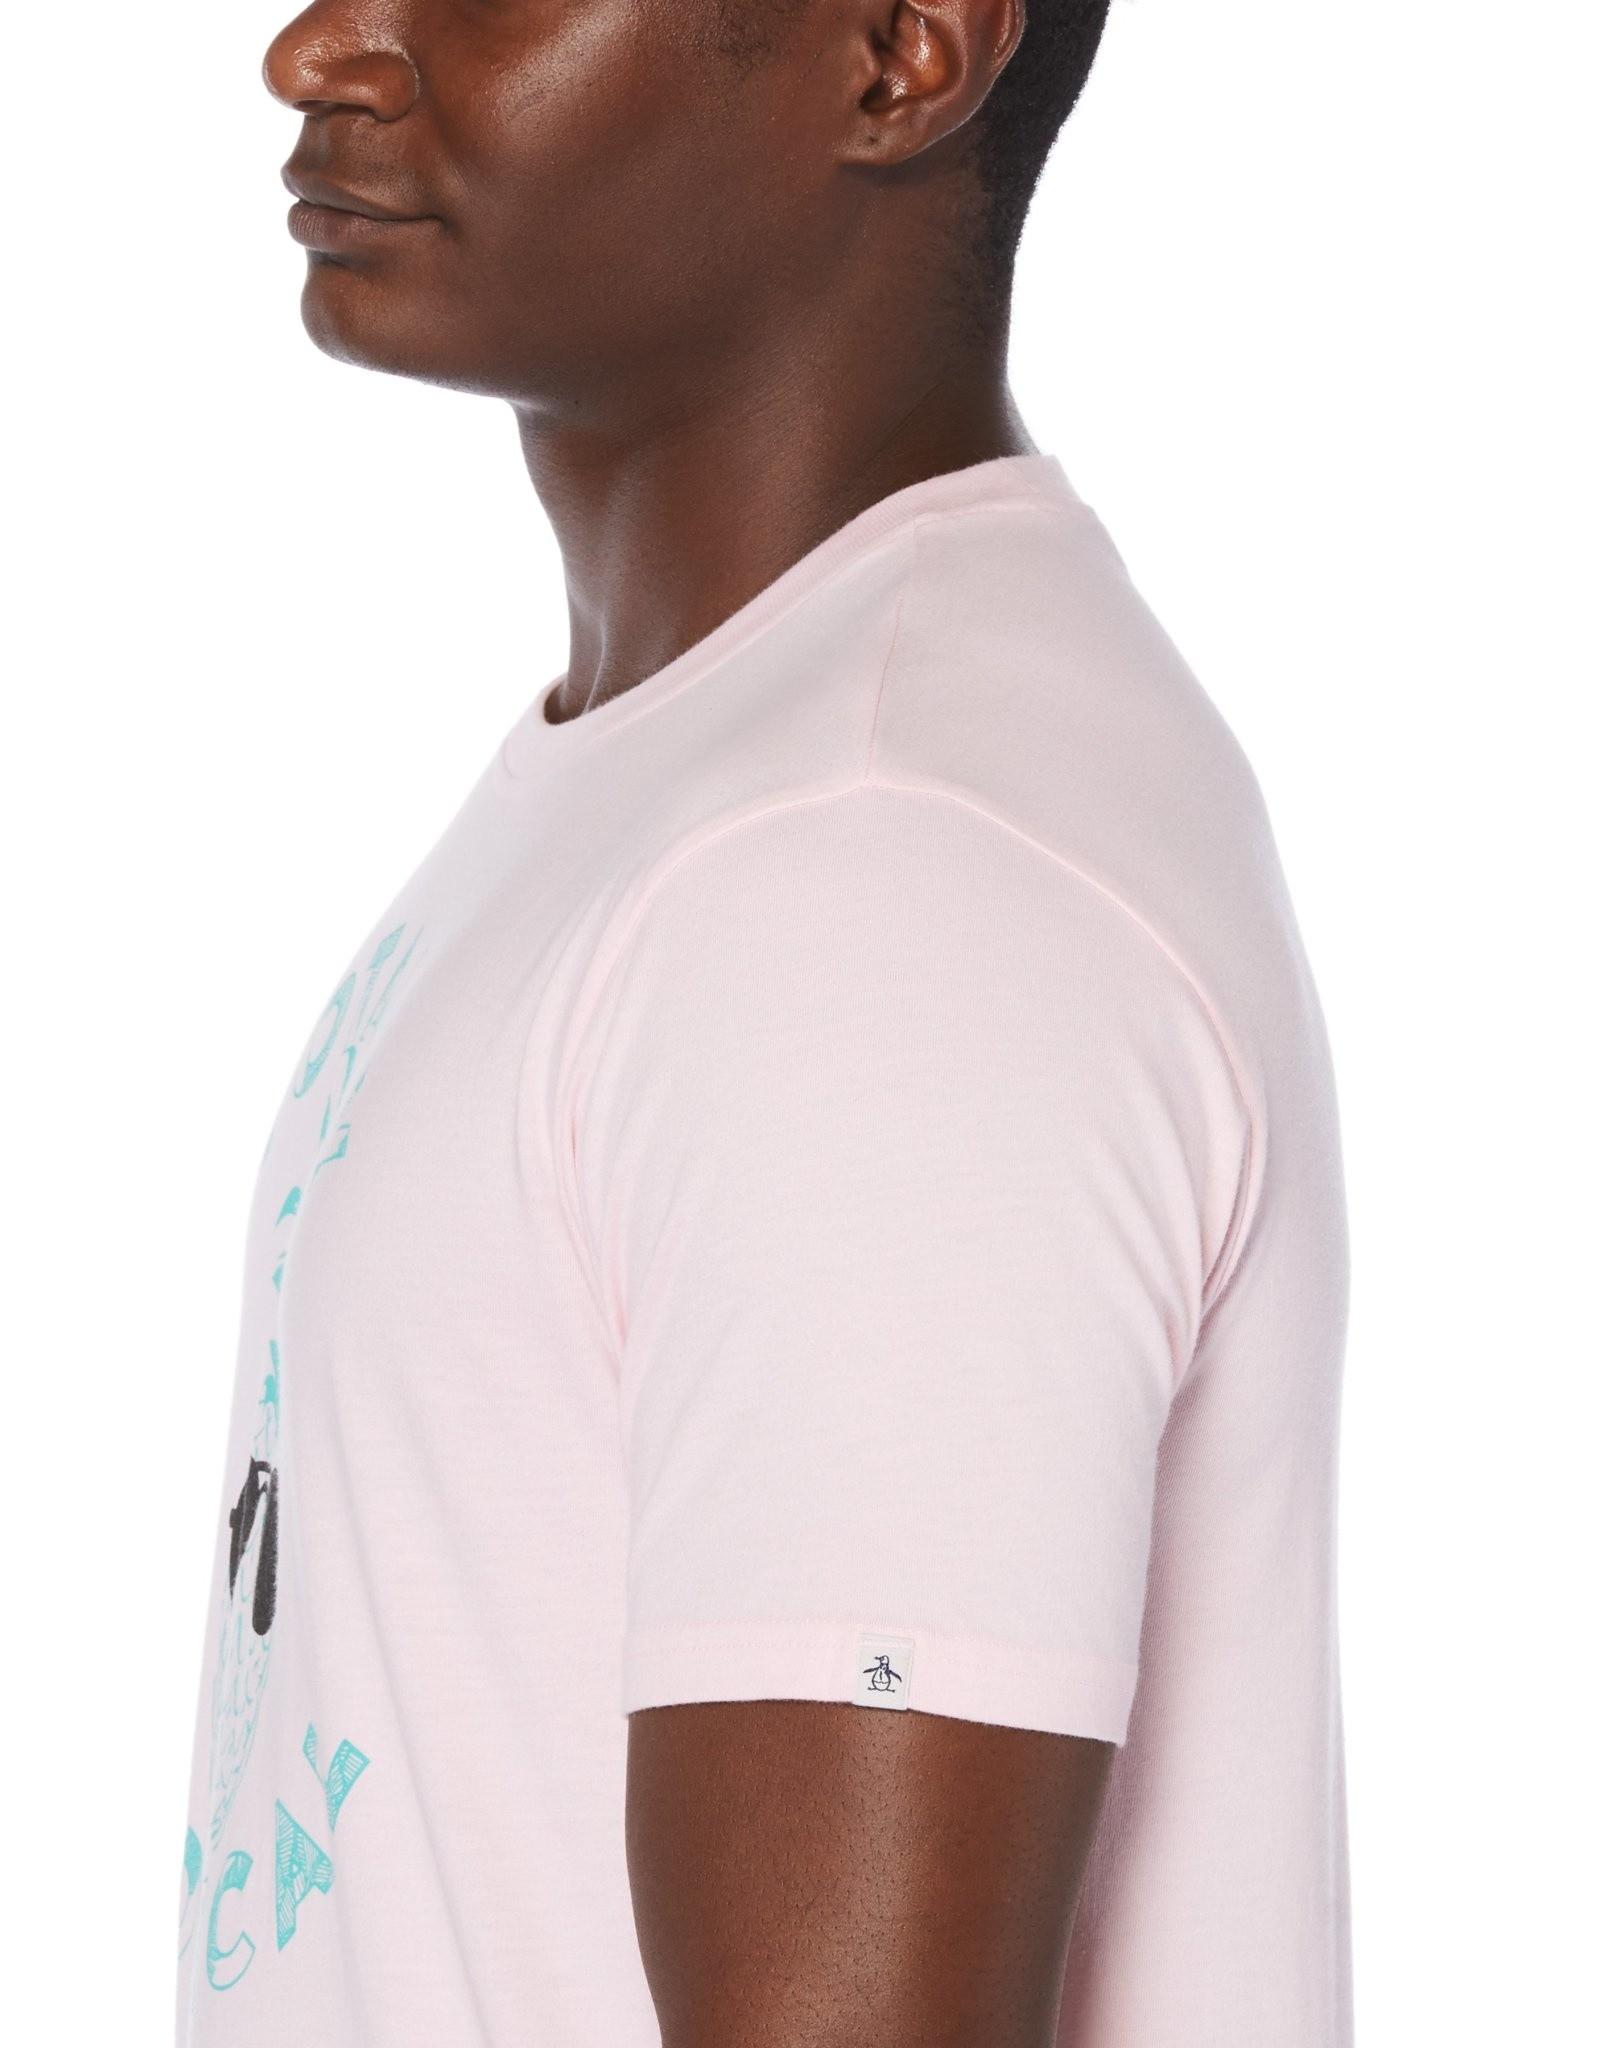 Penguin Totally Tropical T-Shirt